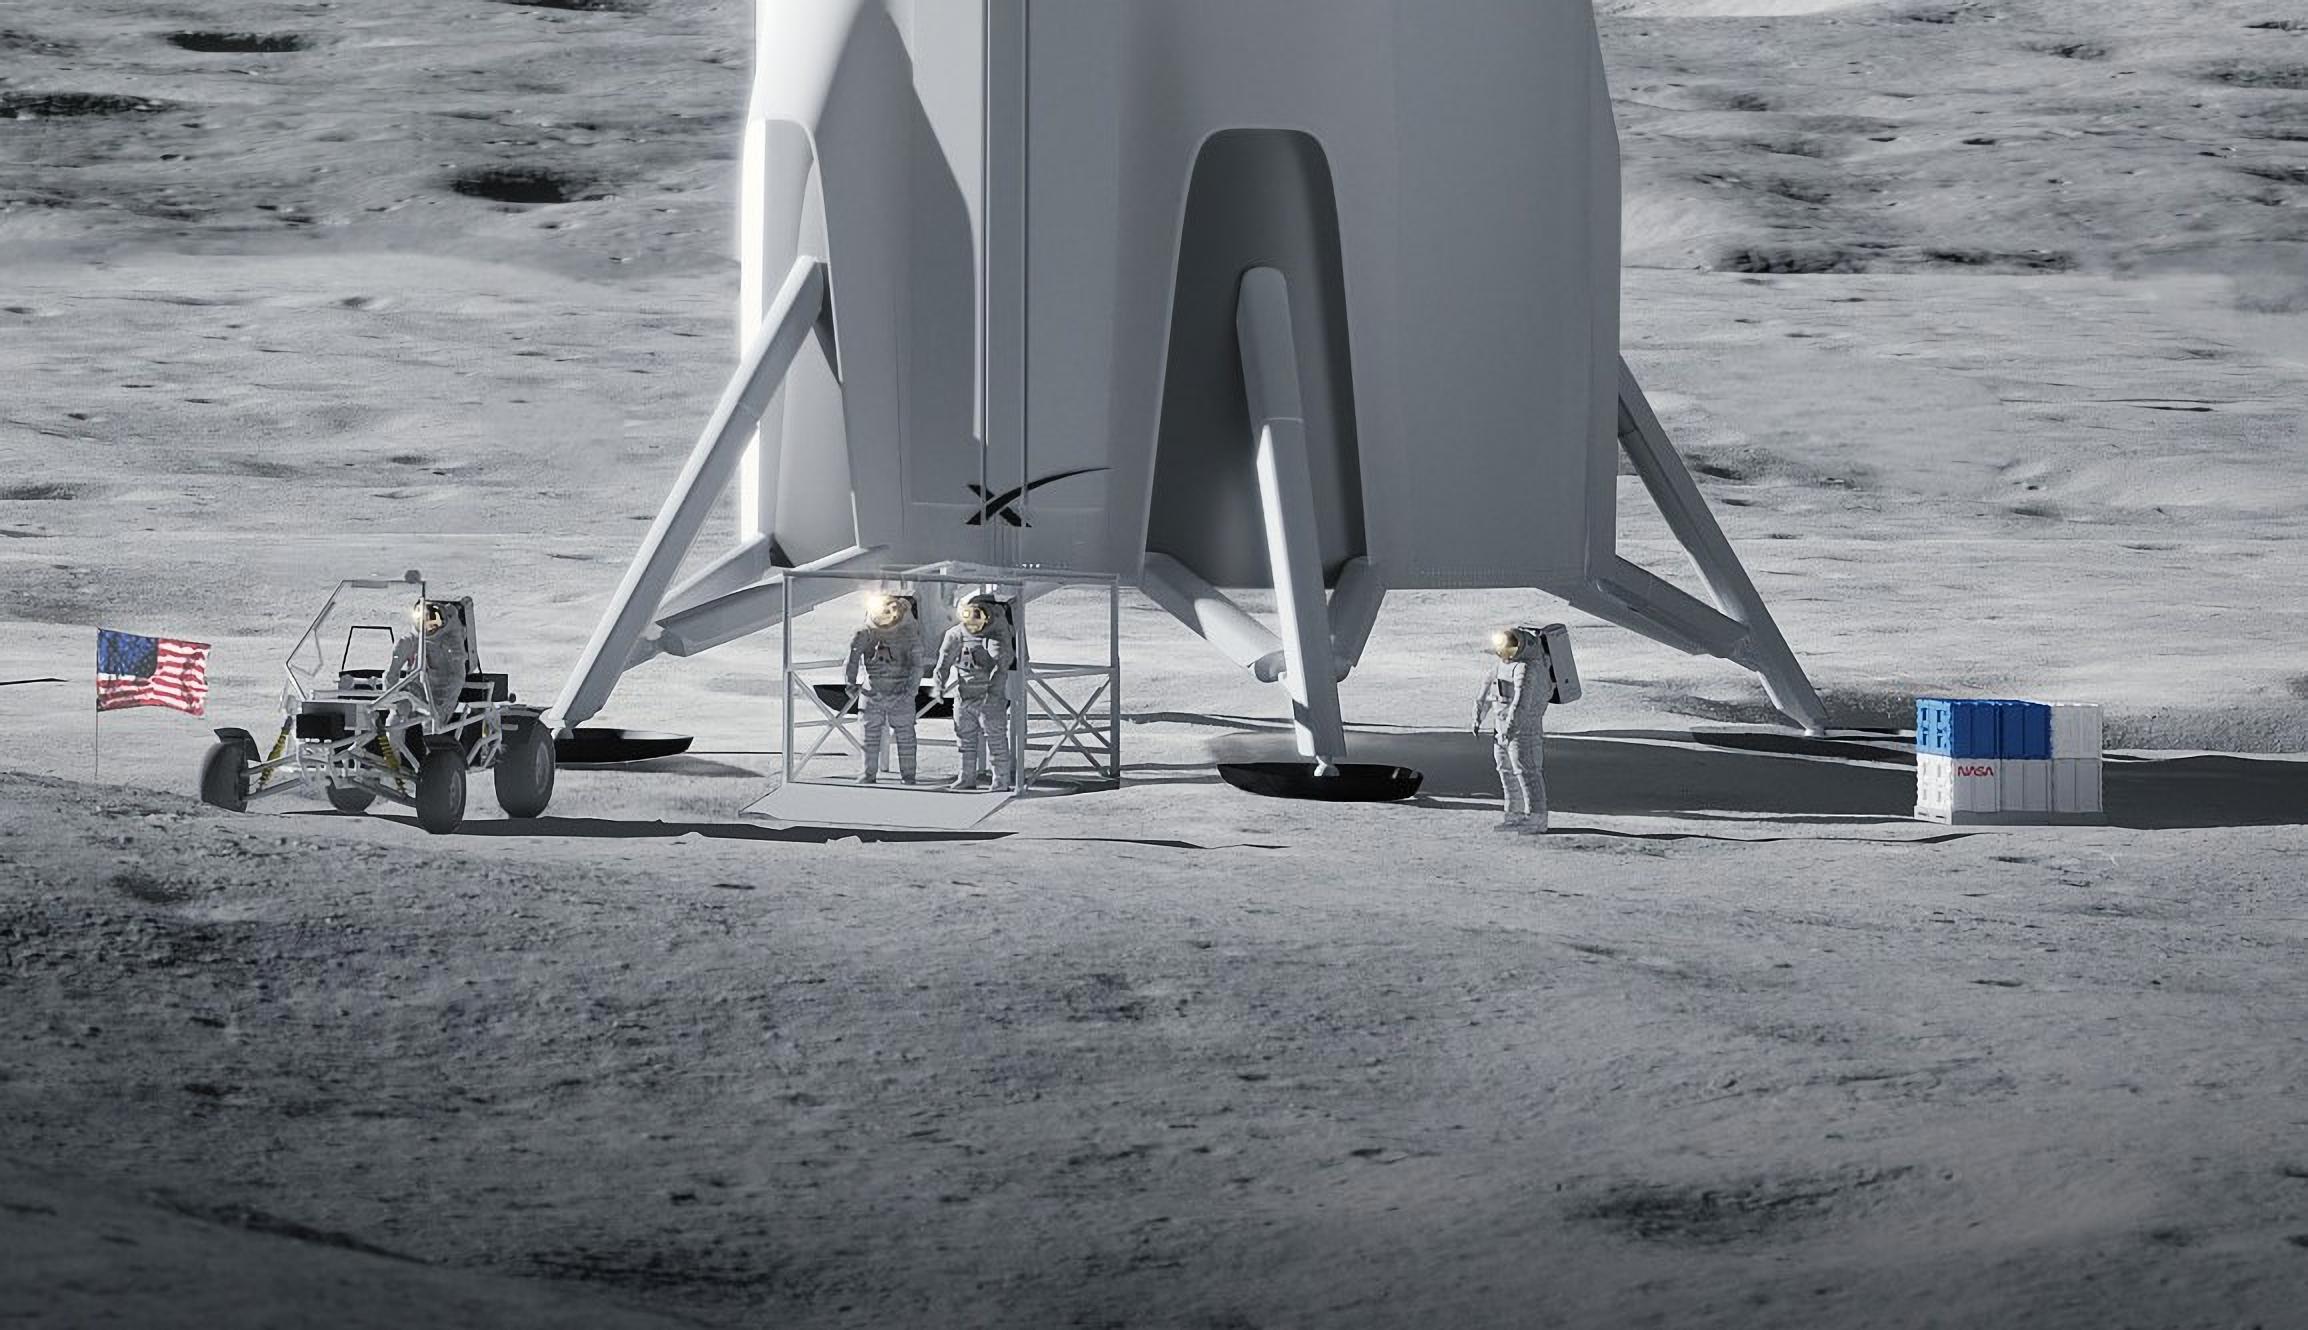 Lunar Starship Artemis (SpaceX) 2021 render 2 suits 2X